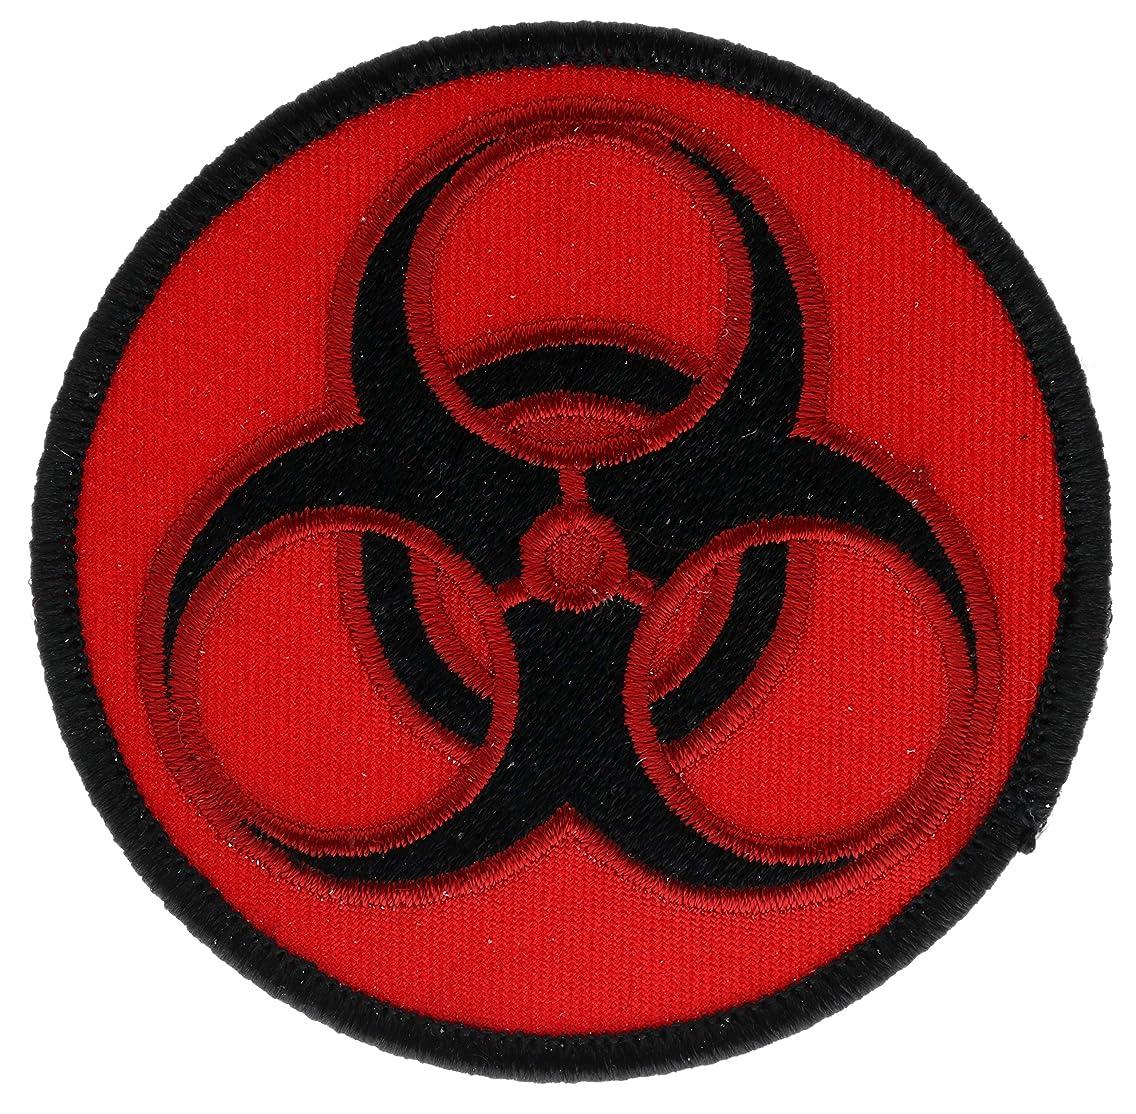 Biohazard Symbol Black on Red 3